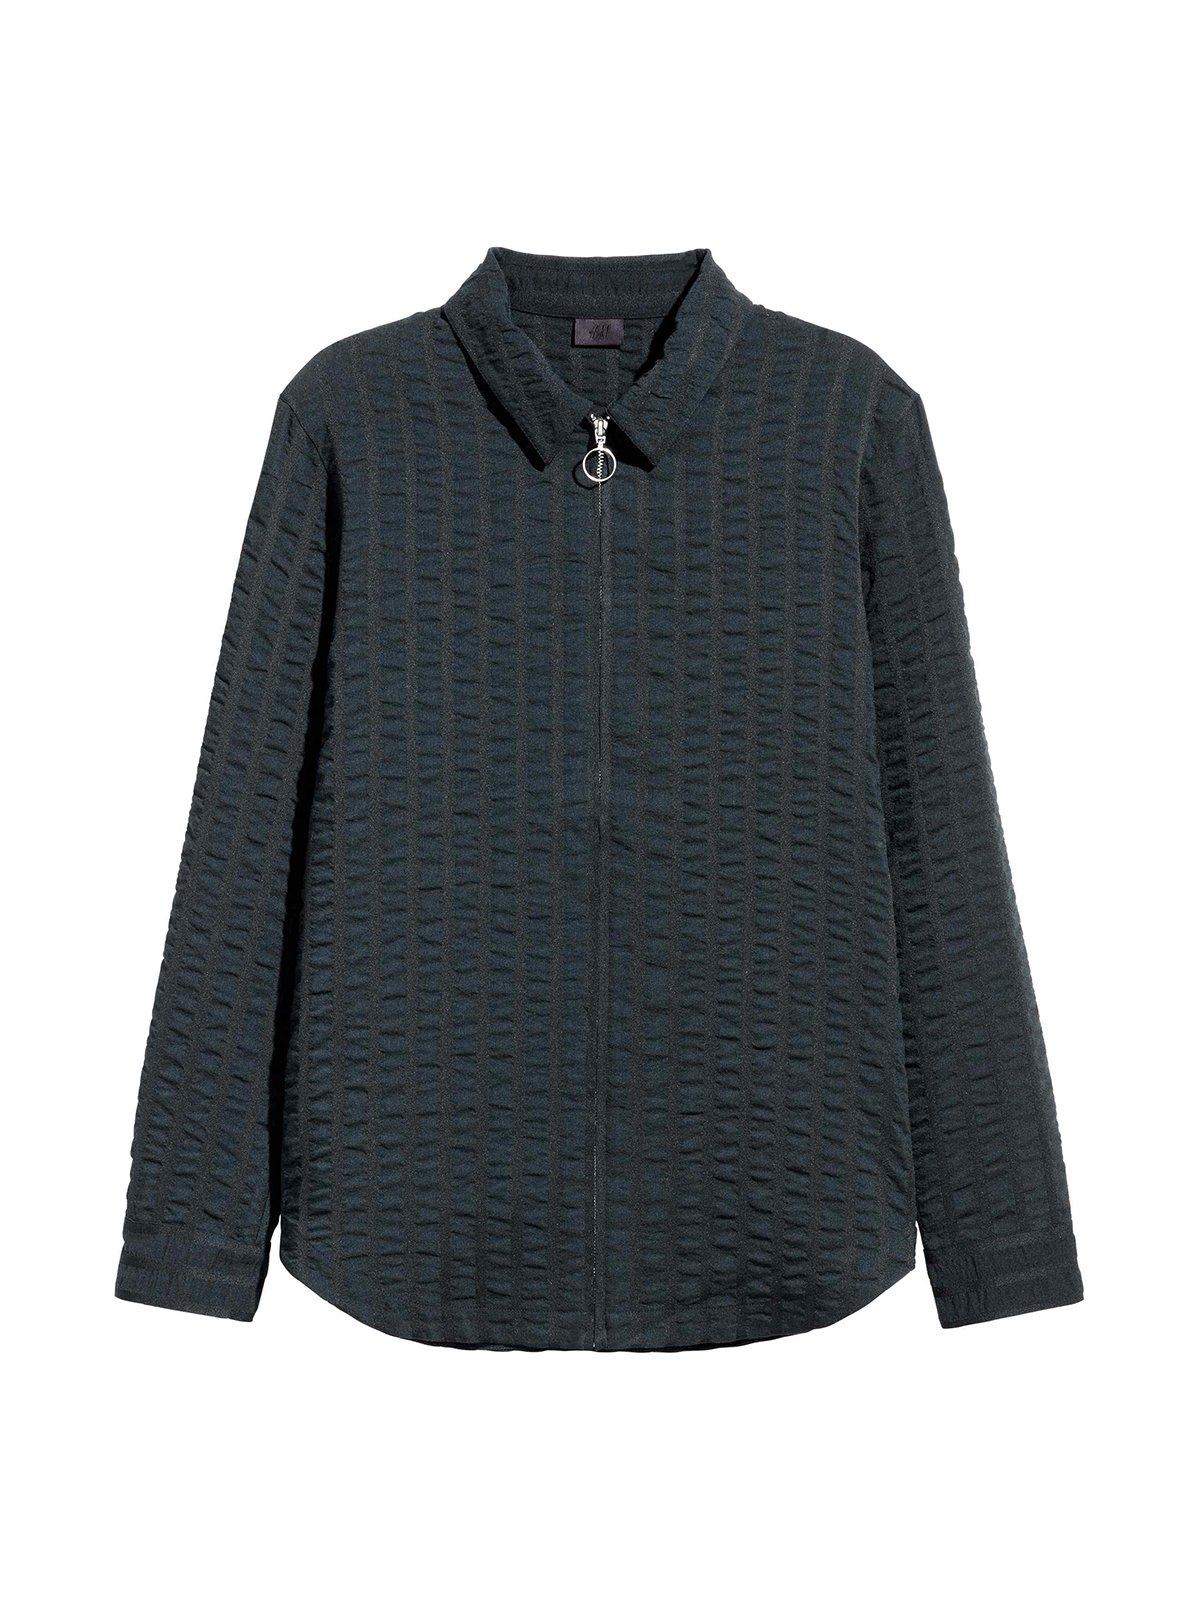 Куртка темно-синя   3401338   фото 2